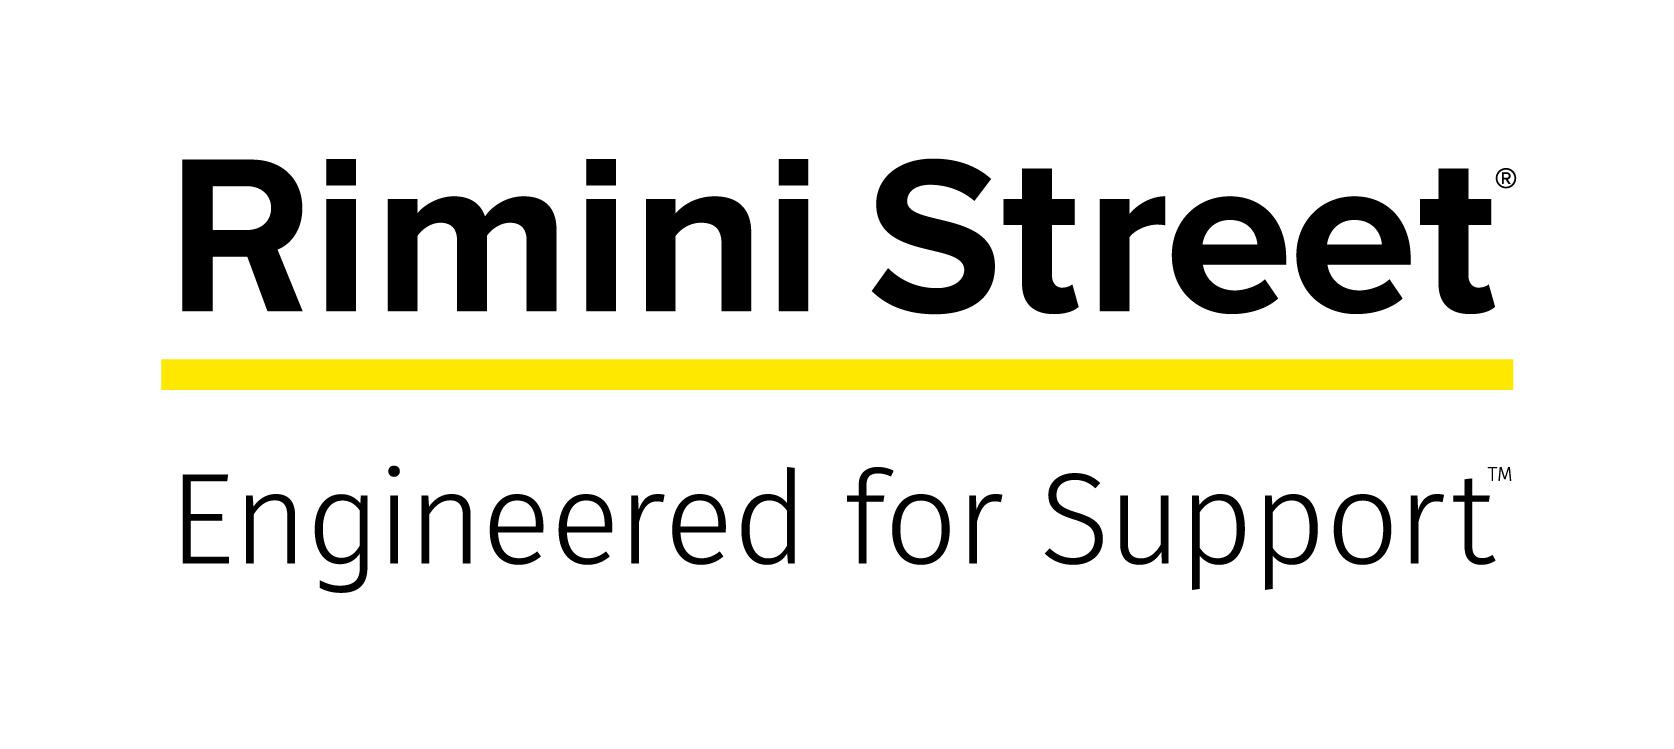 Rimini Street Obtains Australian Single Touch Payroll Certification